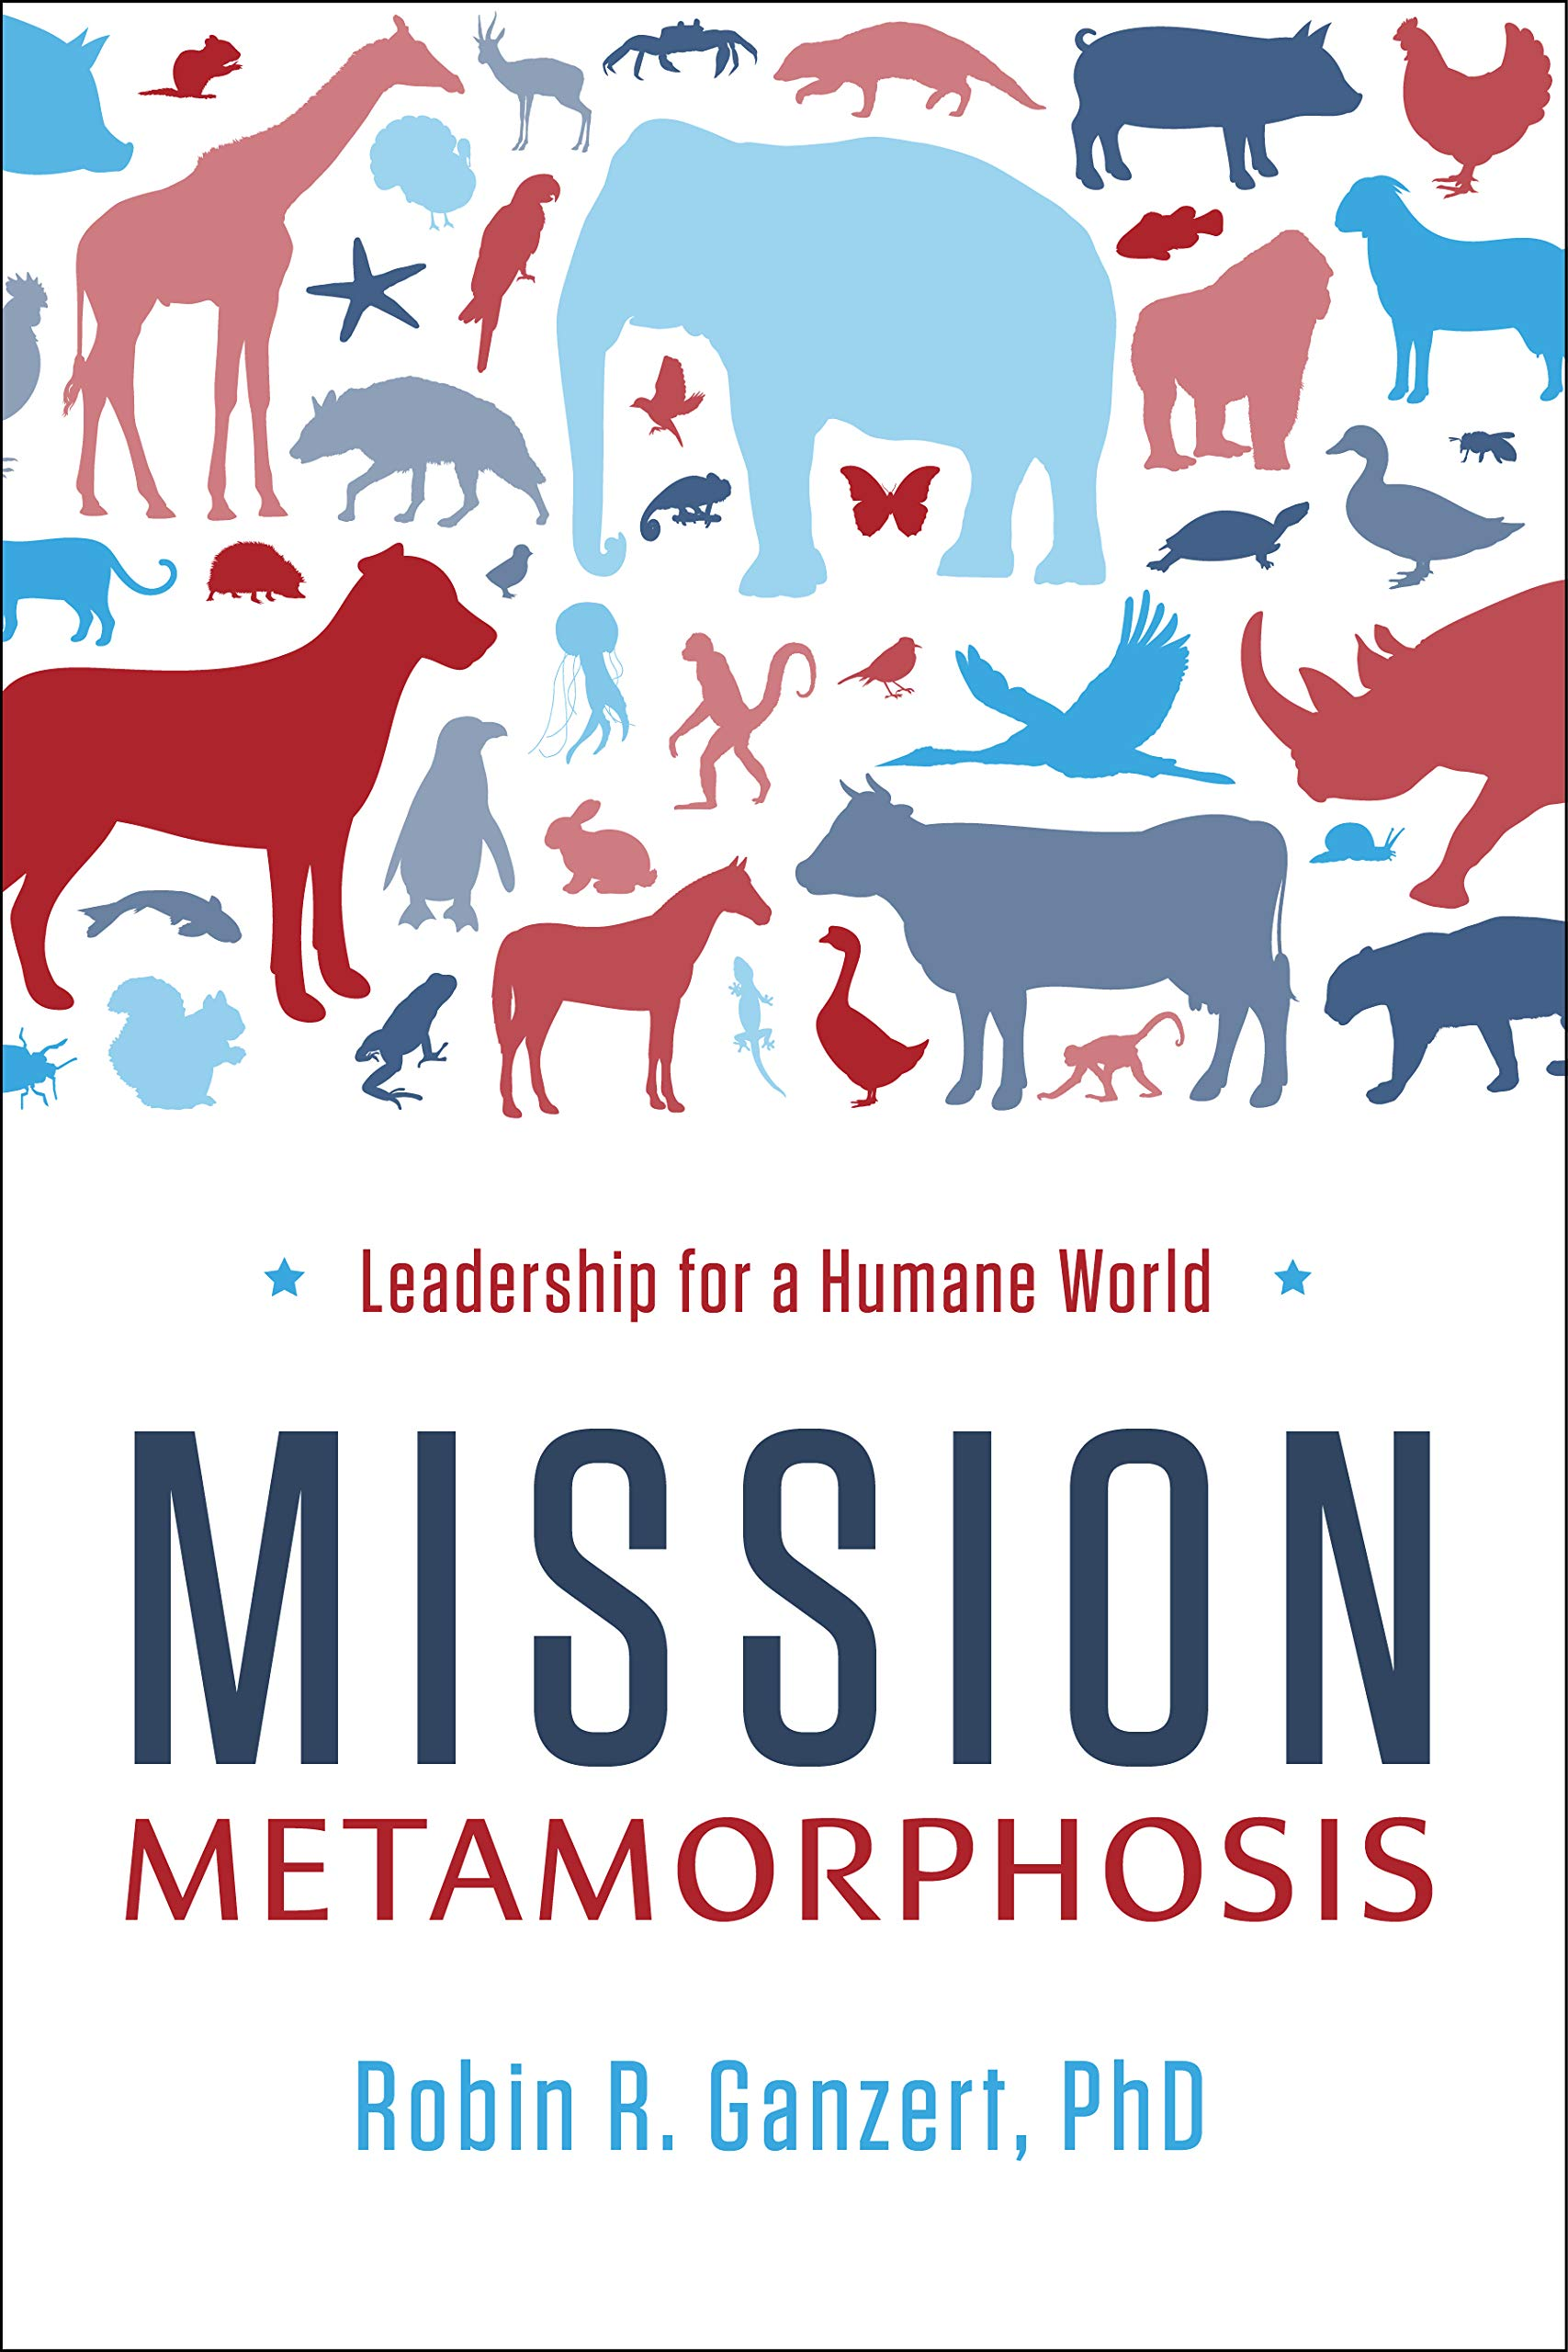 Mission Metamorphosis: Leadership for a Humane World